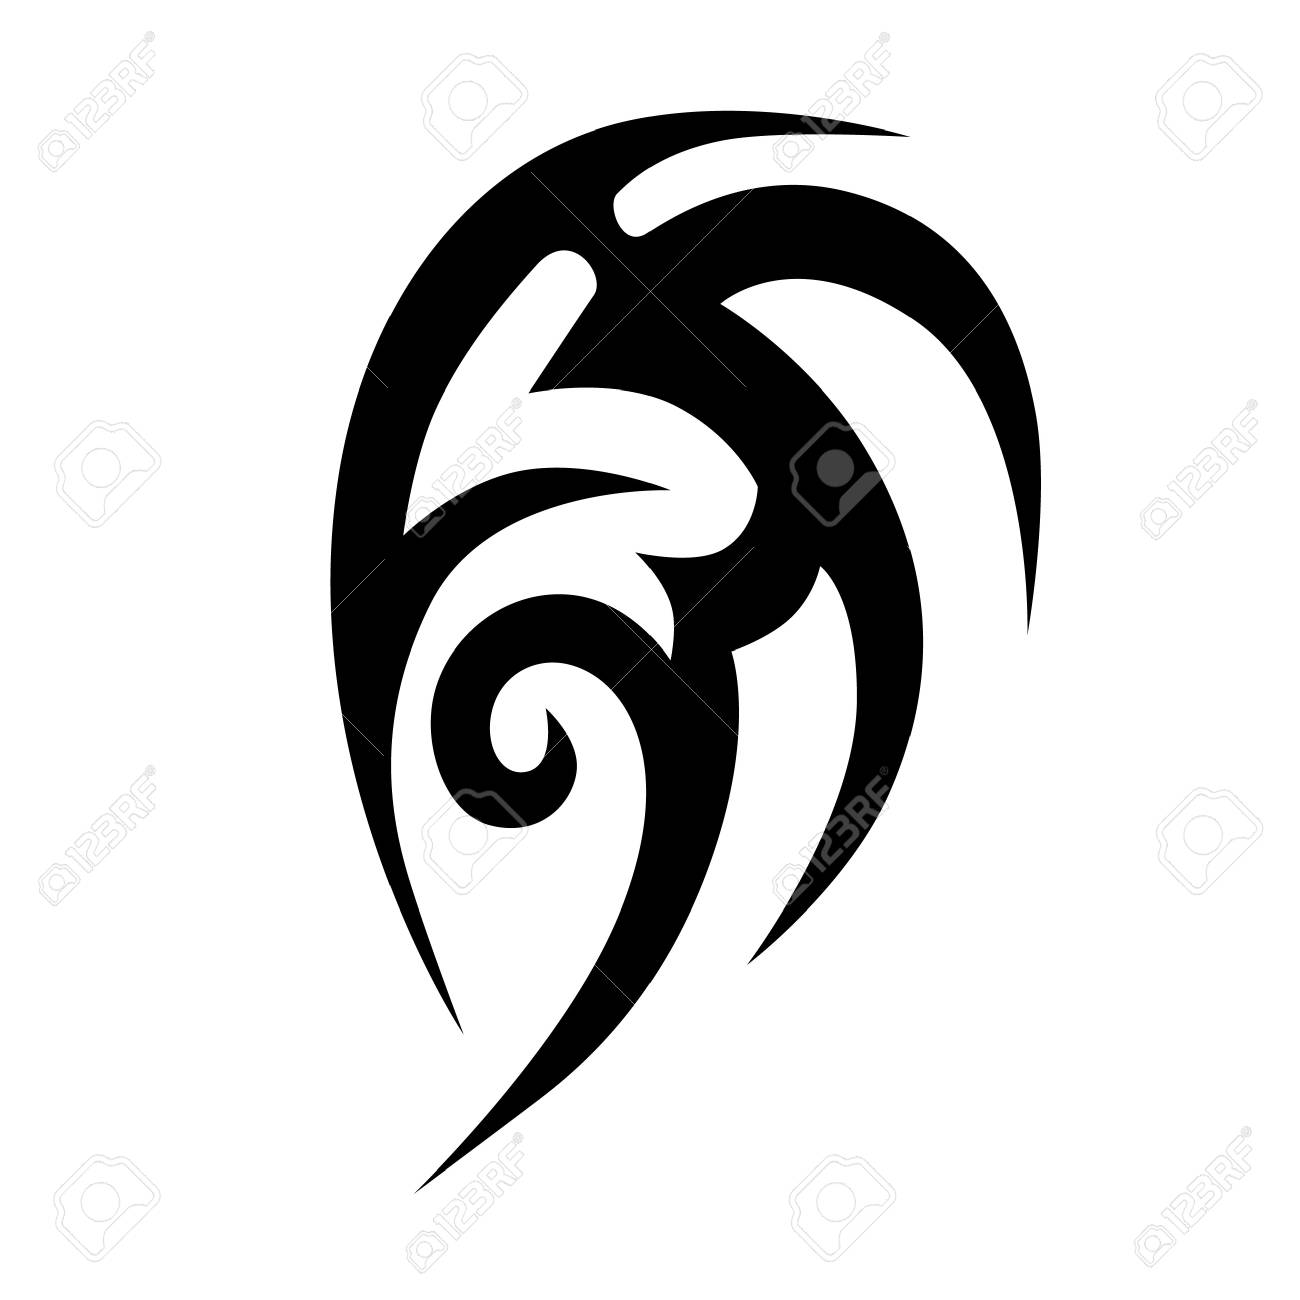 7c7117d16 Simple sketched vector designs. Tribal tattoos. Art tribal tattoo. Vector  sketch of a